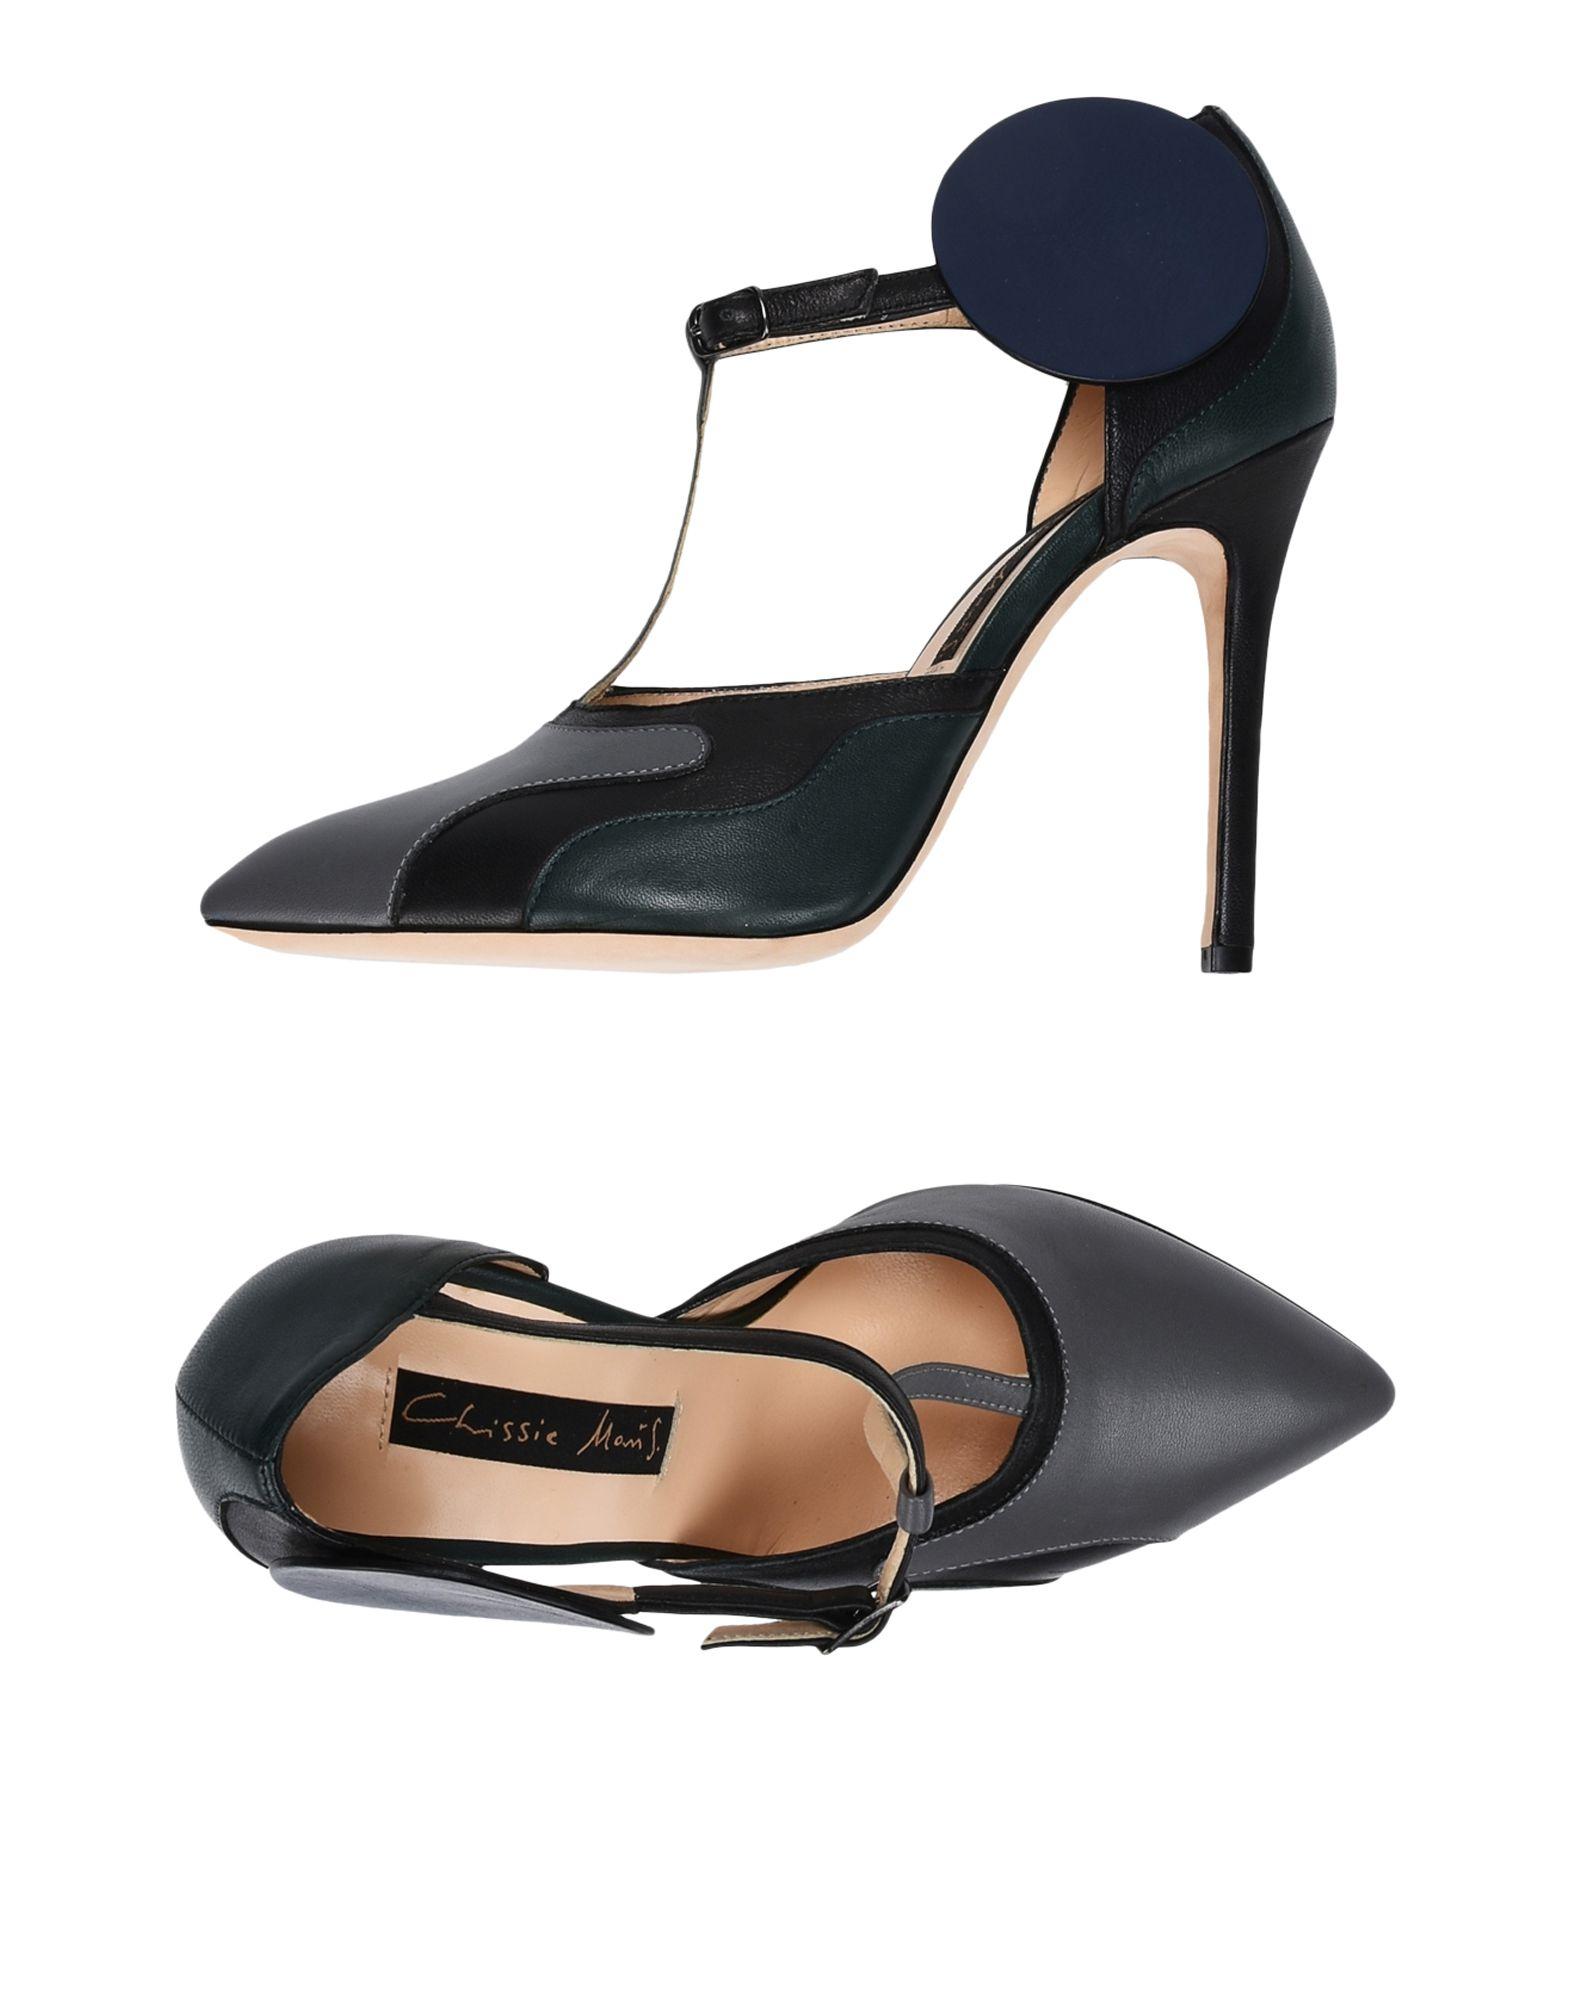 CHRISSIE MORRIS Туфли цены онлайн